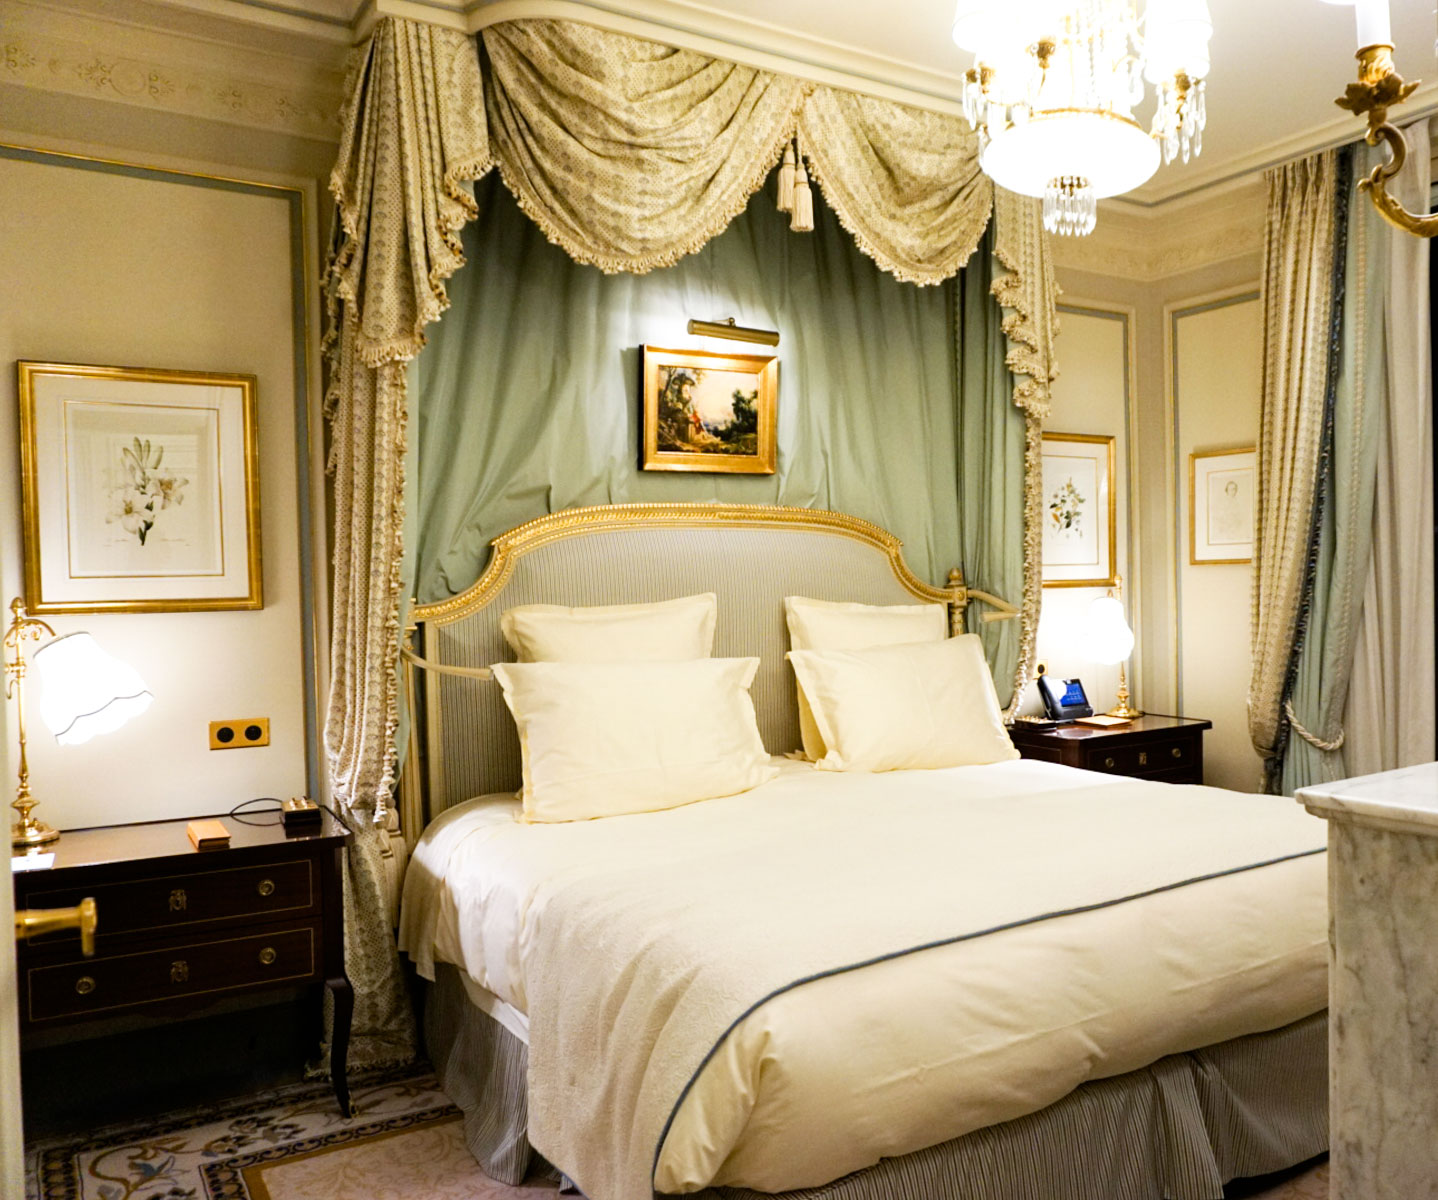 Hotel_Ritz_Paris_Trip_to_Paris-2569.jpg